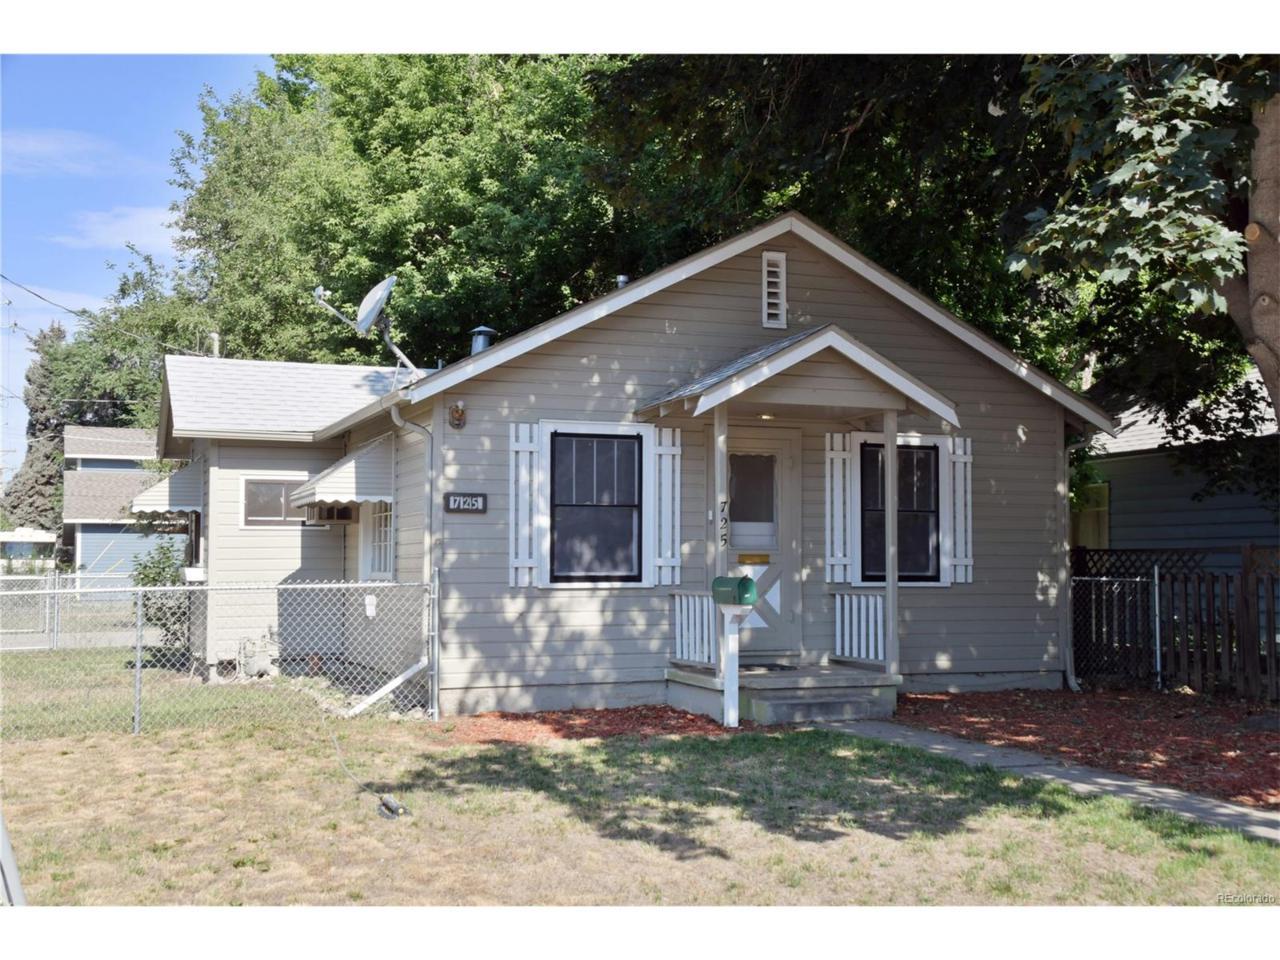 725 Washington Avenue, Loveland, CO 80537 (MLS #6649632) :: 8z Real Estate